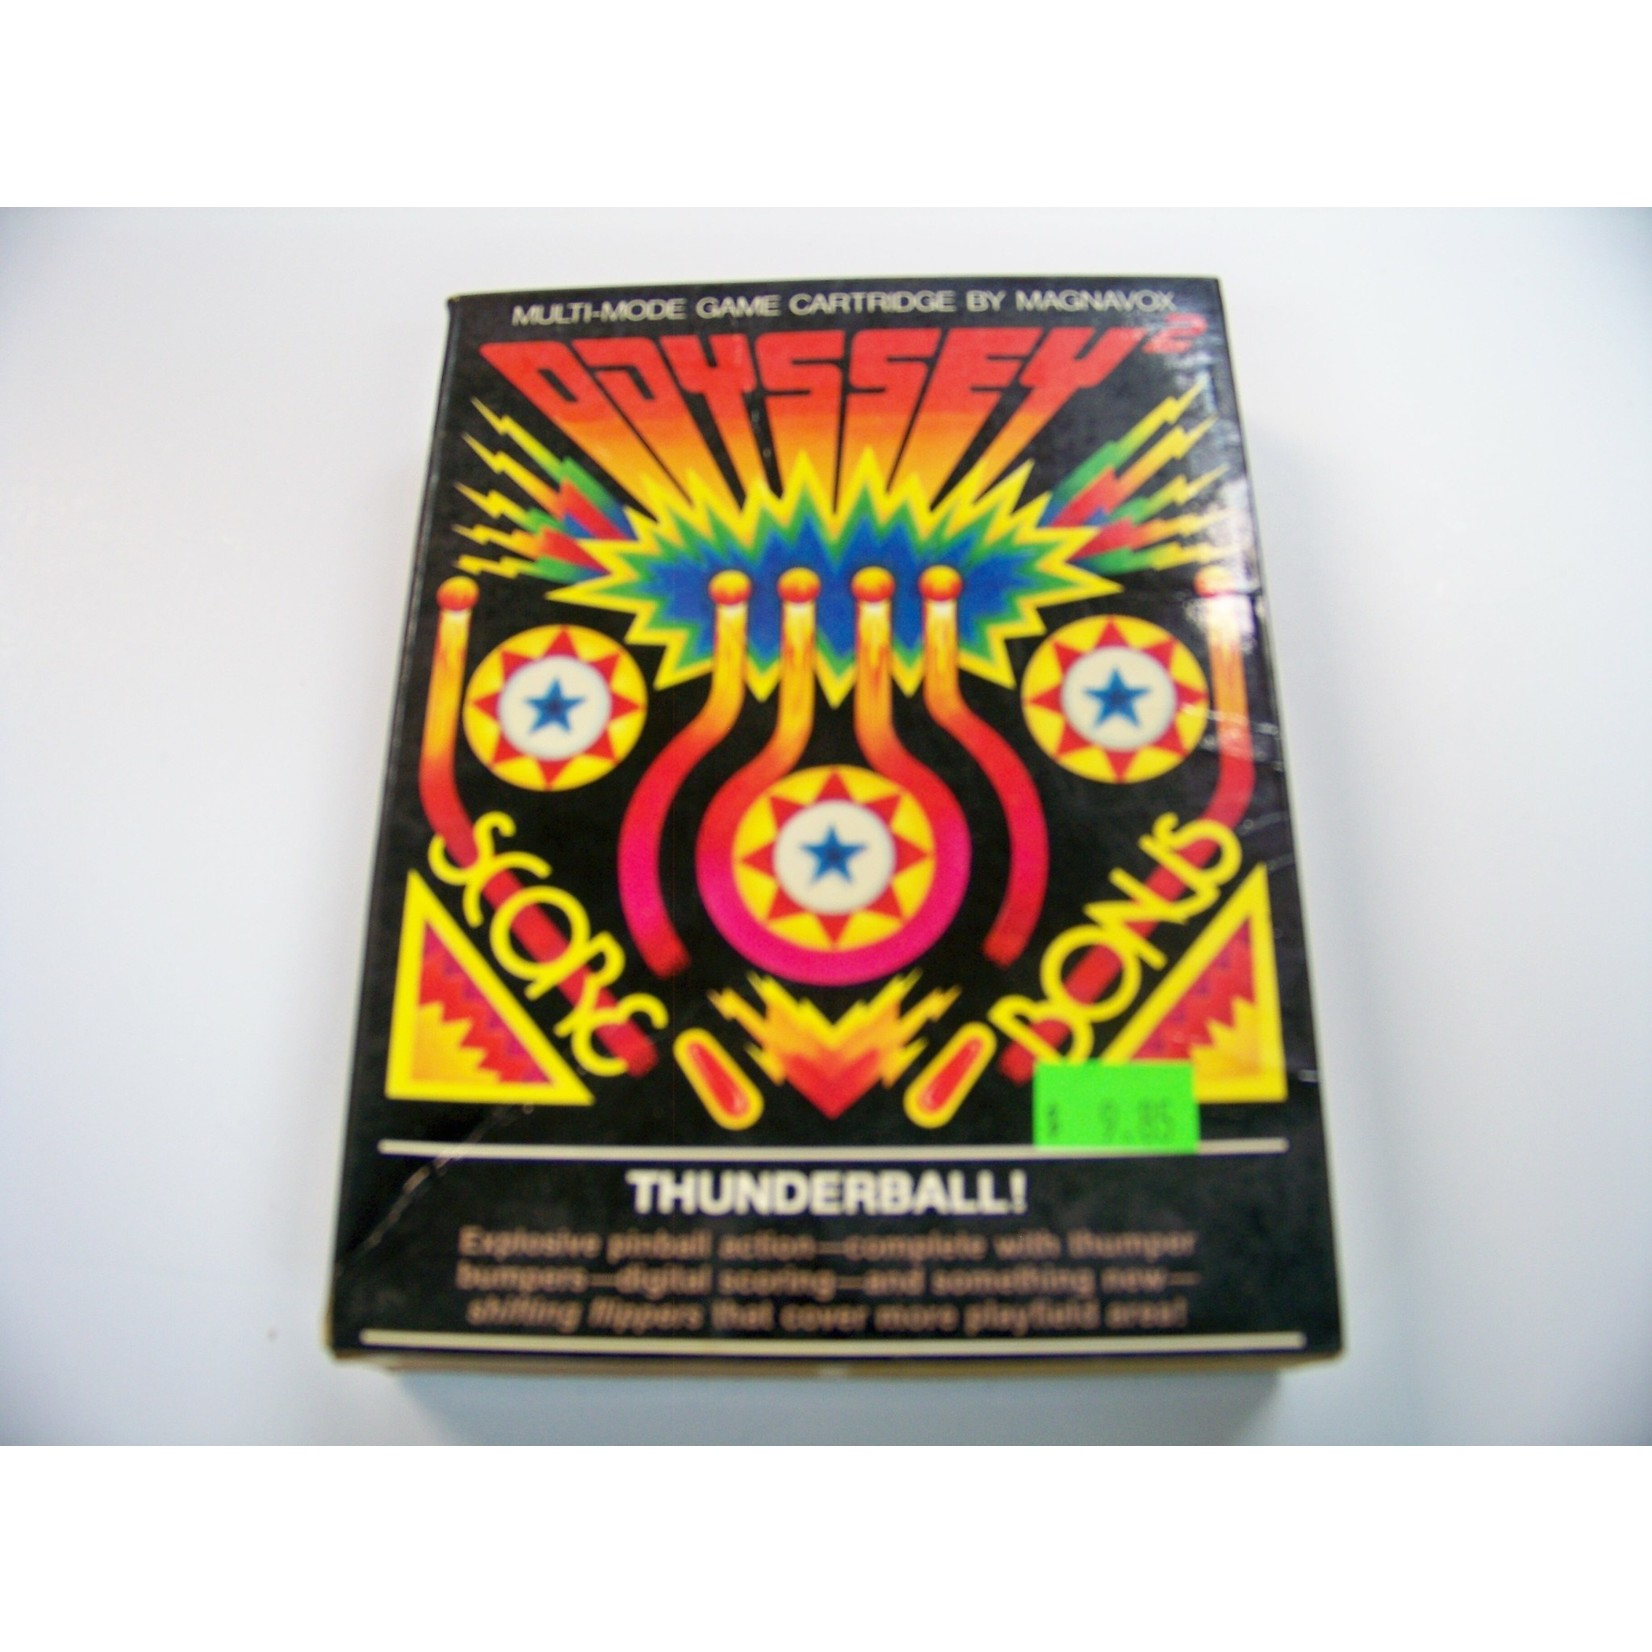 OD2U-Thunderball (BOXED)